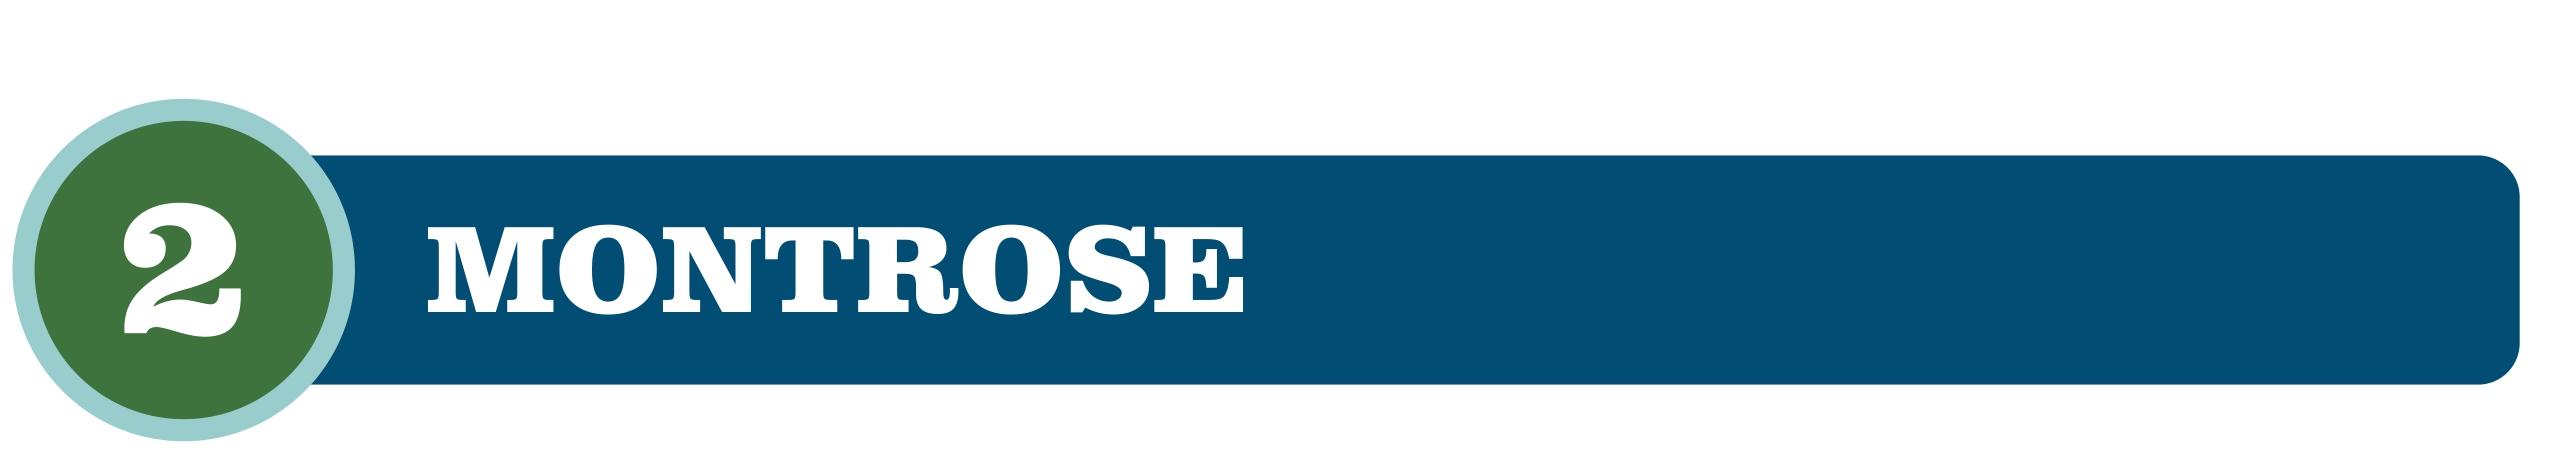 Montrose Header